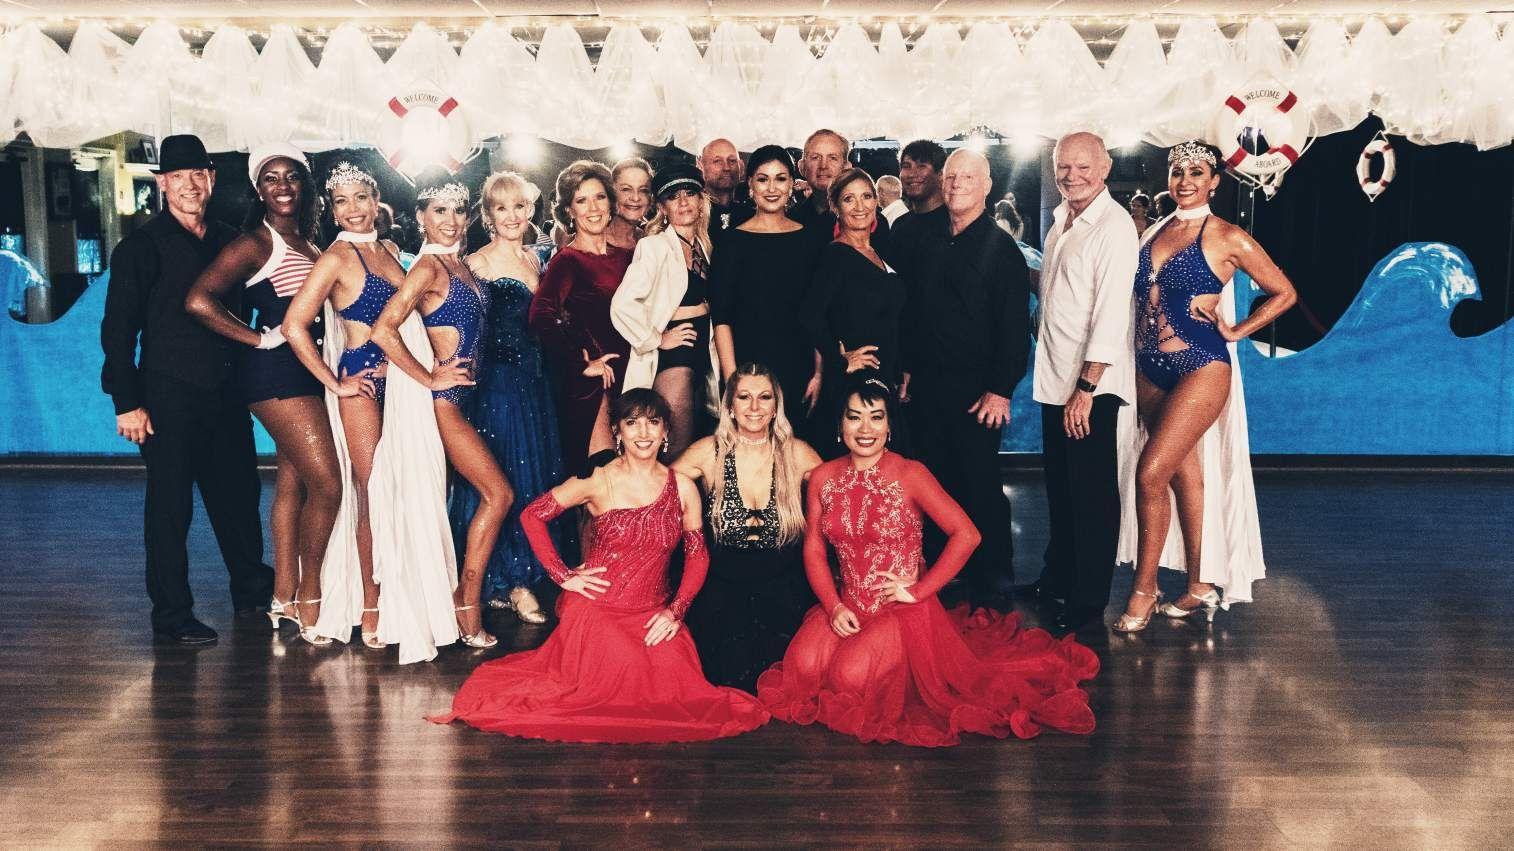 Temecula Valley Ballroom Dance Club